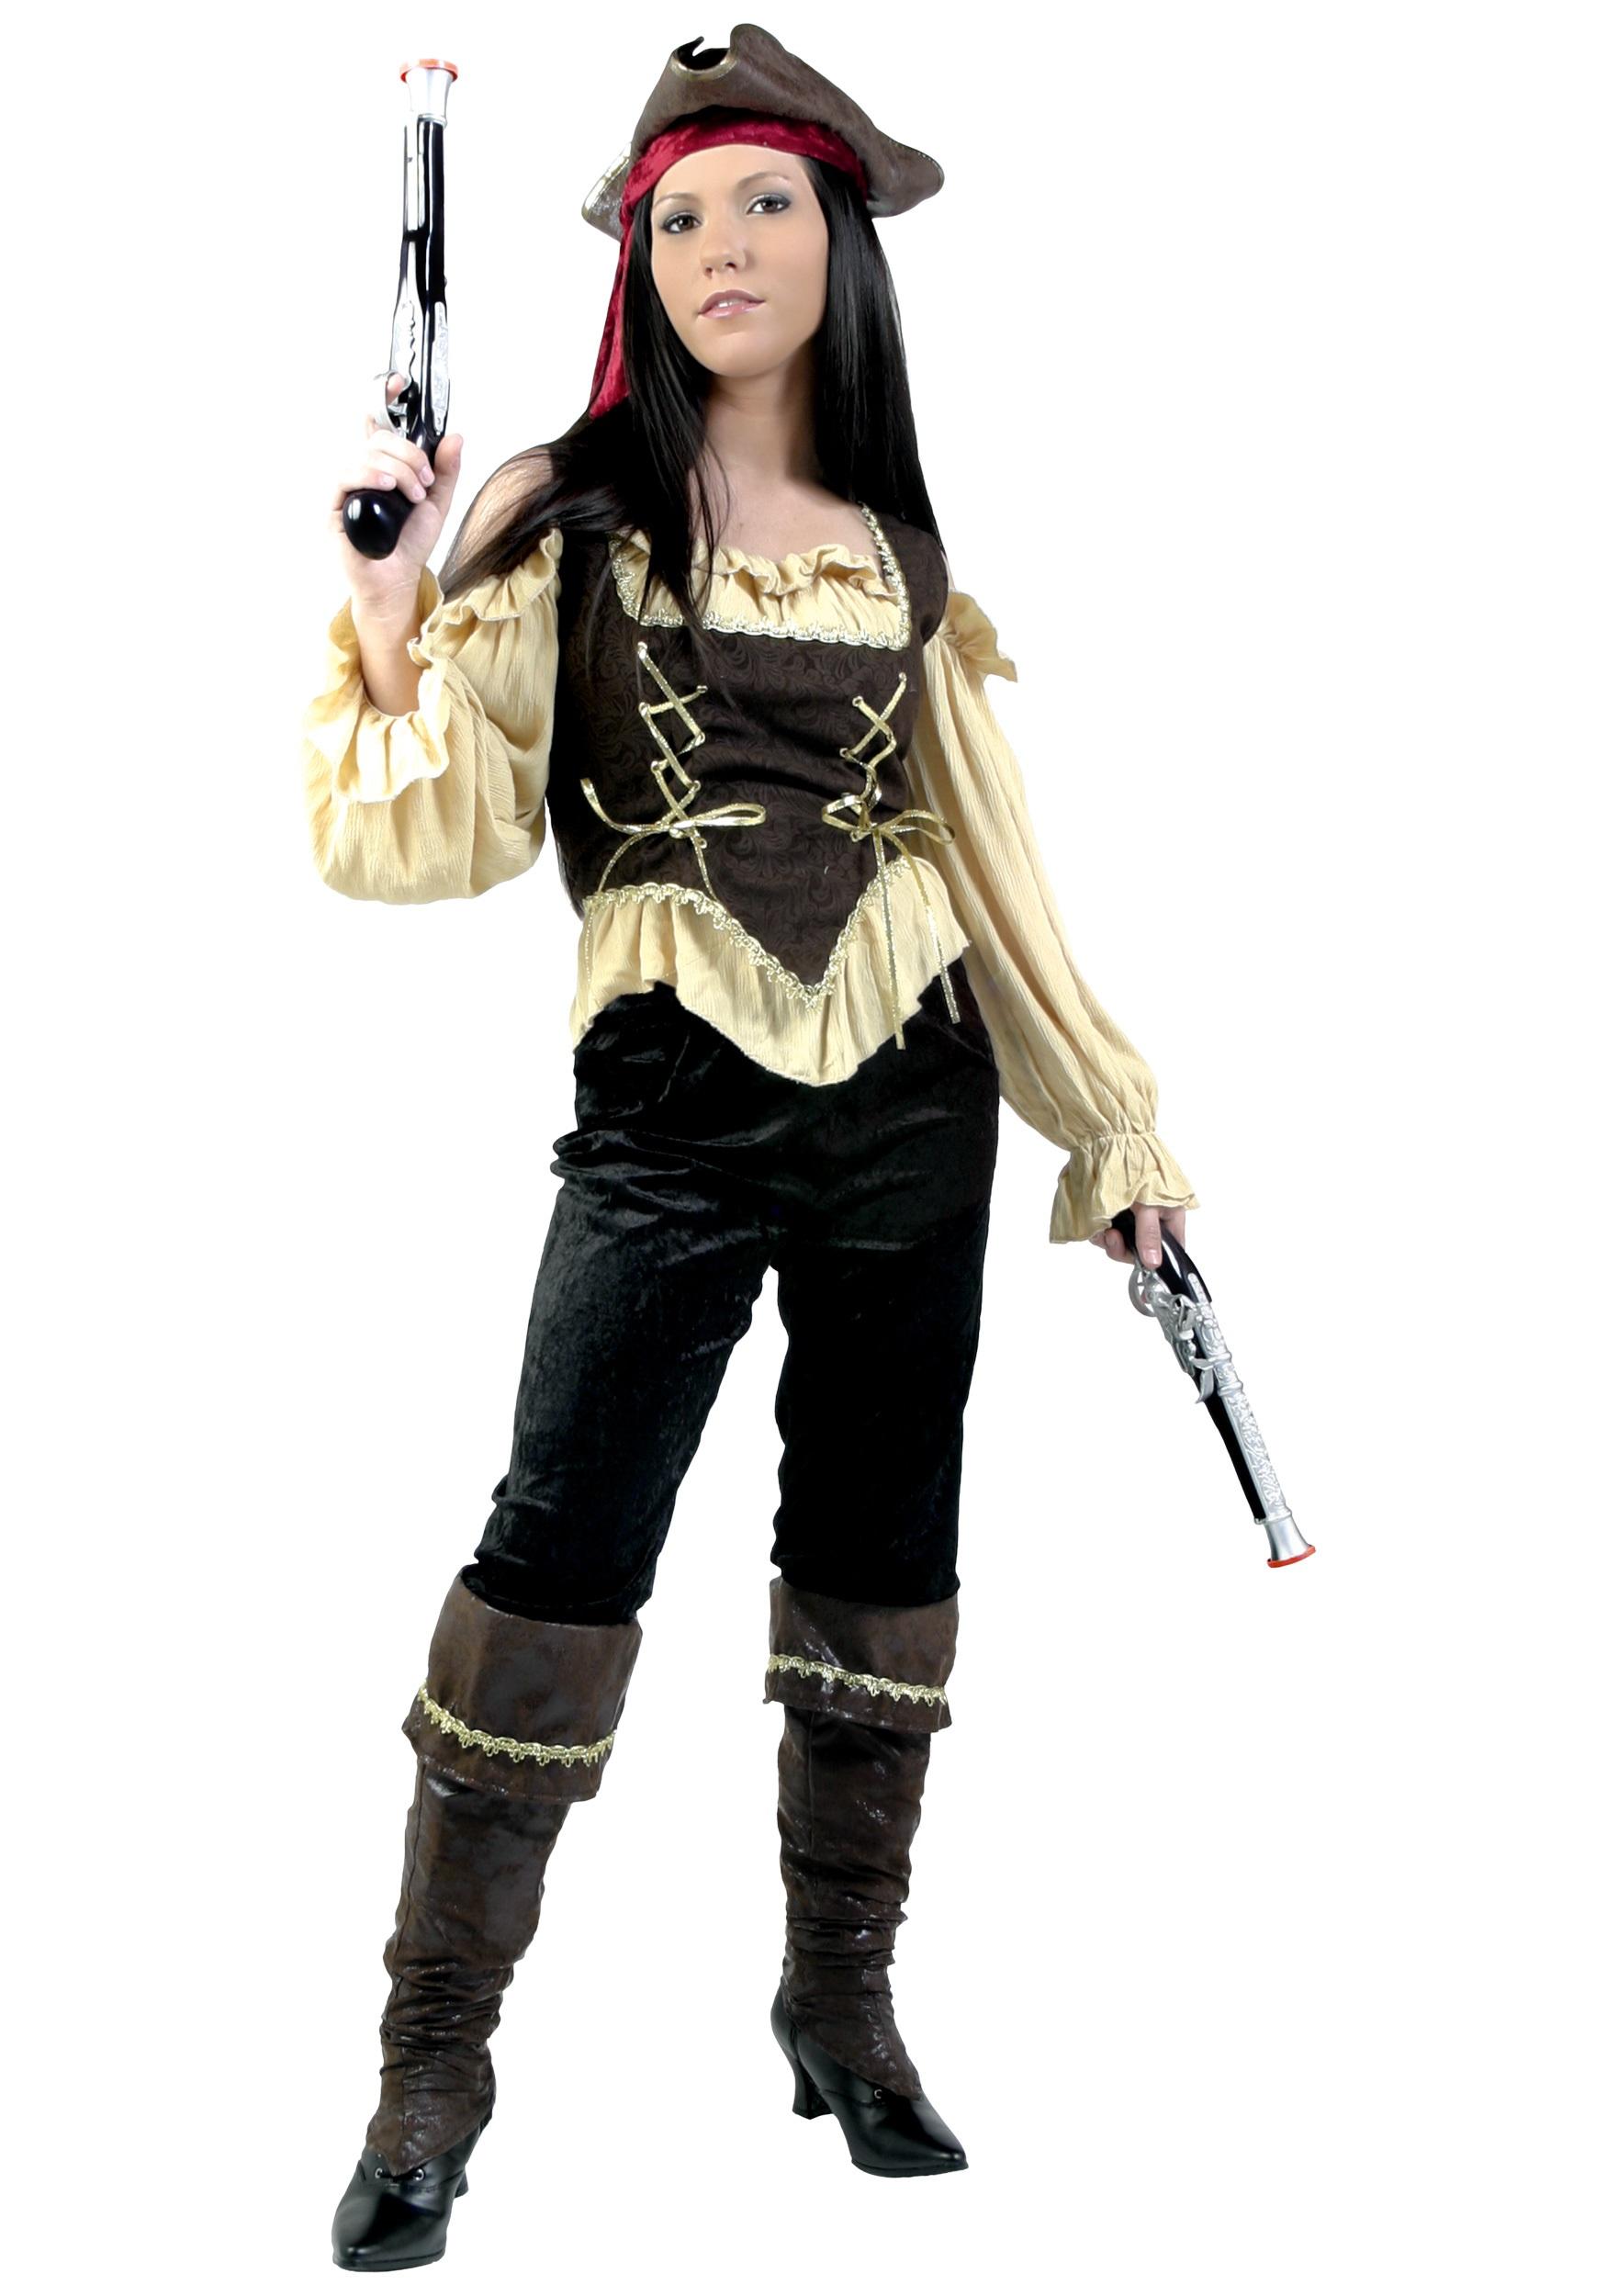 womens rustic pirate costume - Halloween Pirate Costume Ideas